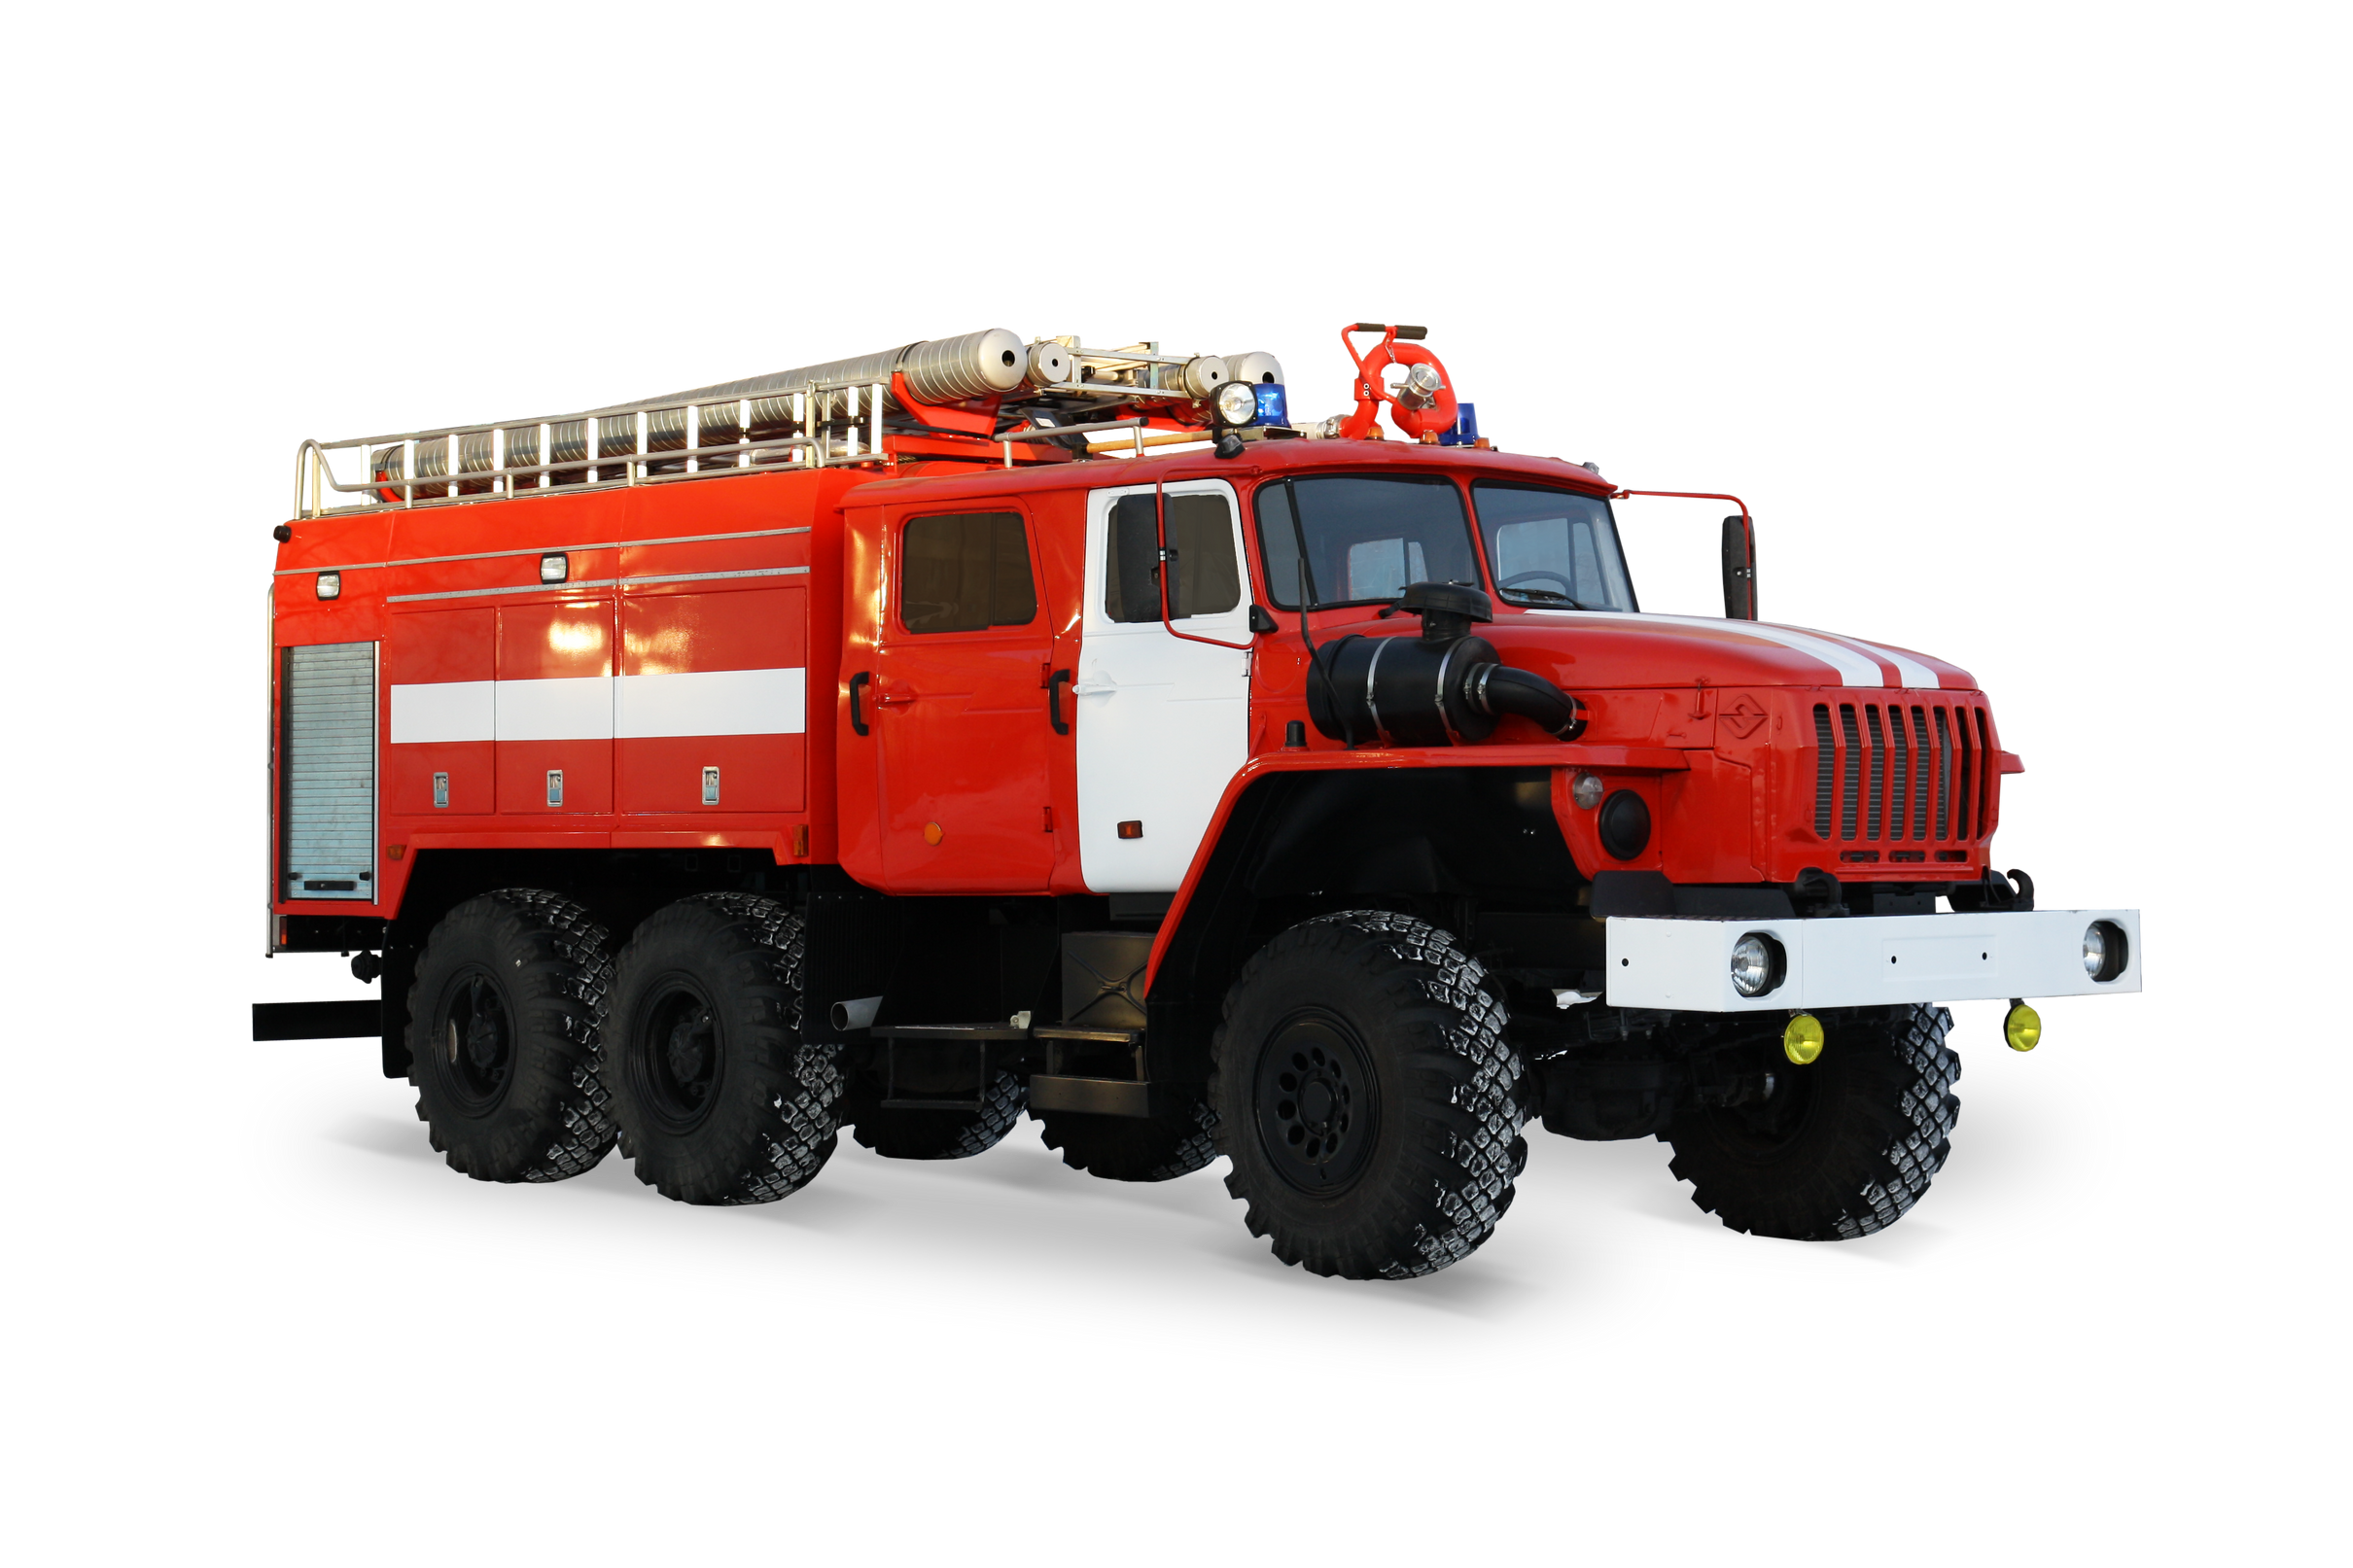 Tank truck fire-fighting AC 6 40 URAL-5557